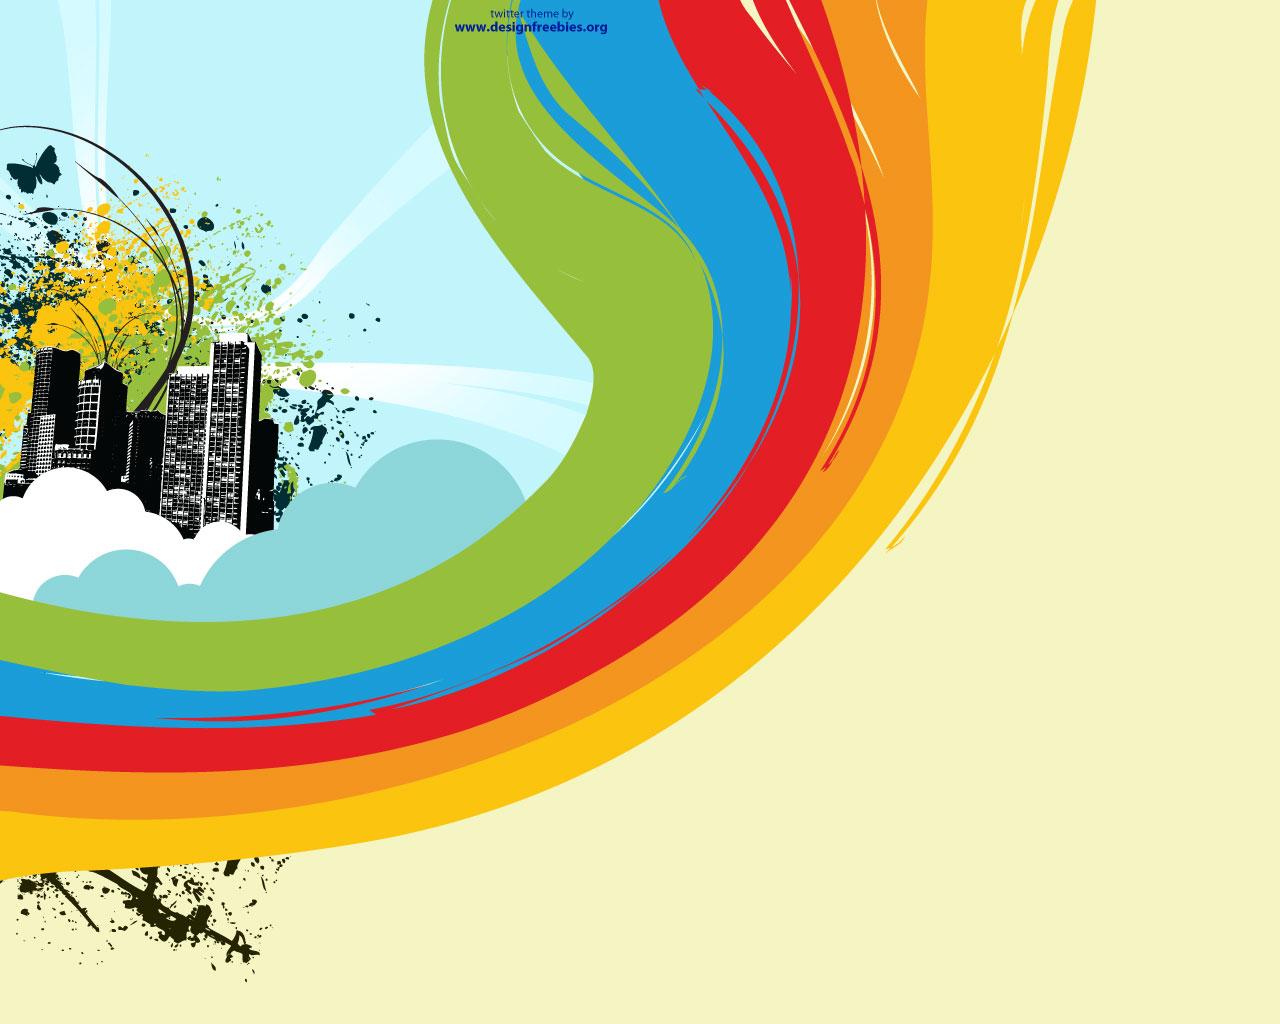 Backgrounds - Kishore Babu Yarlapati's Designs